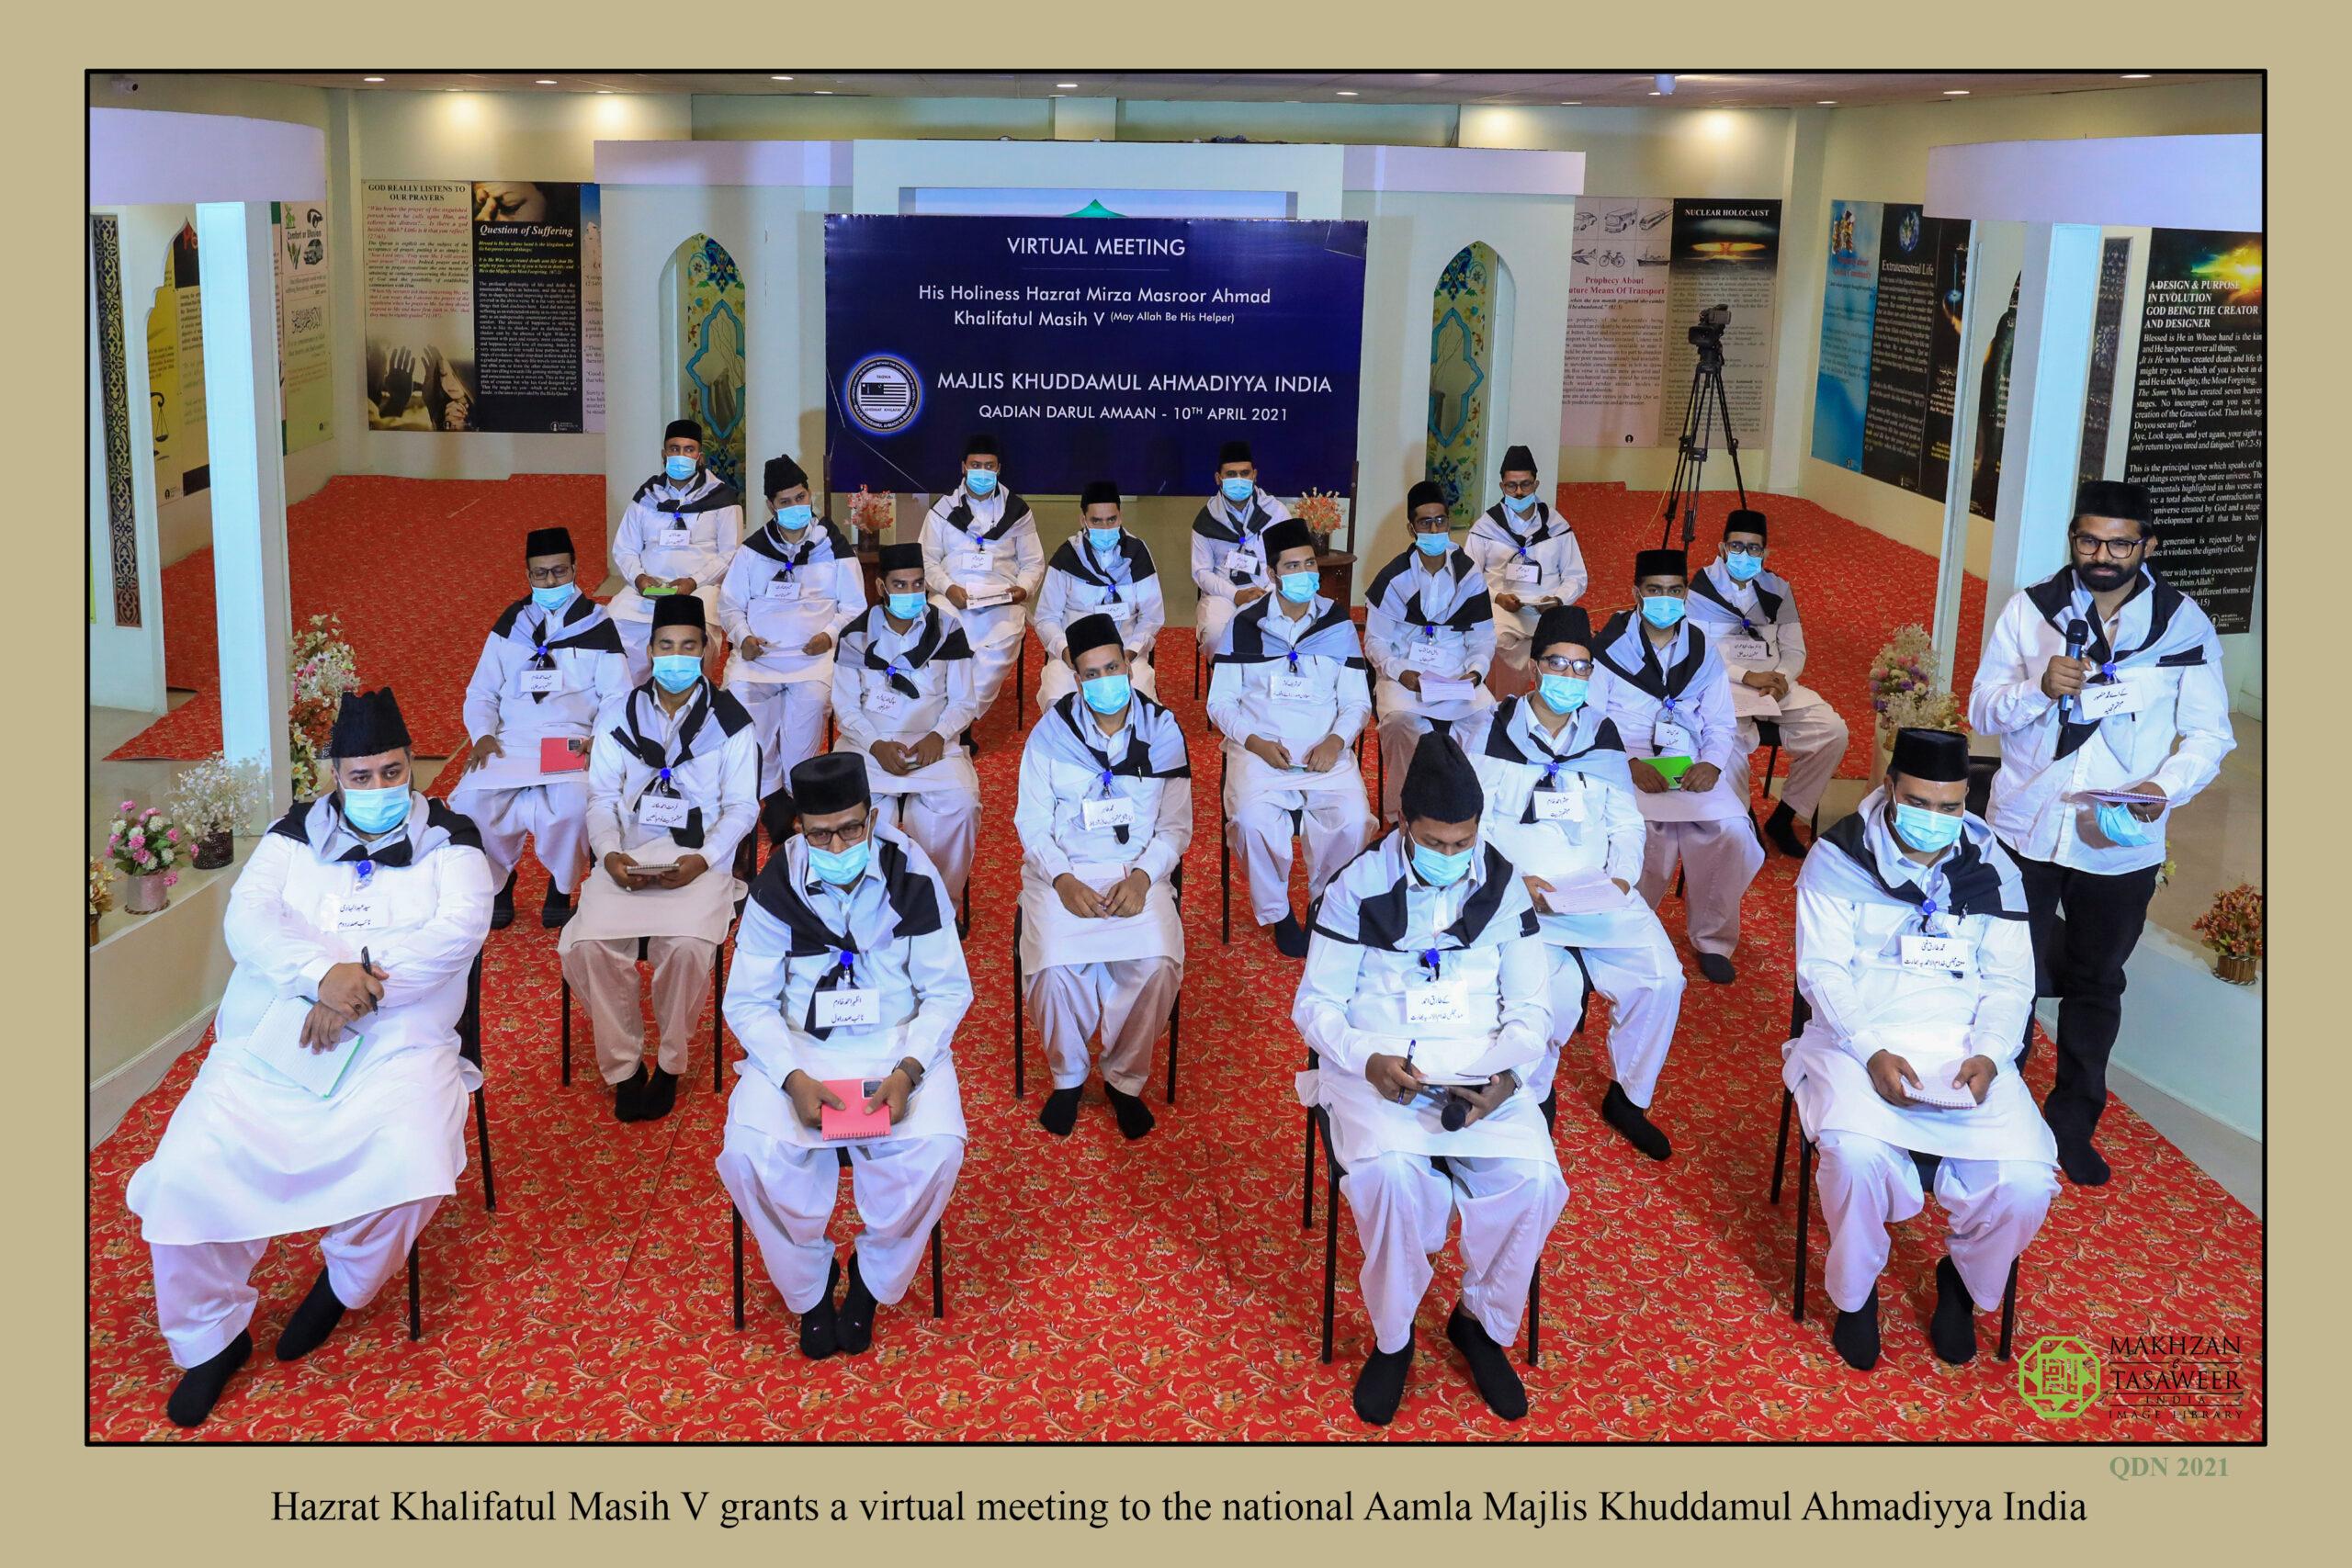 Hazrat Khalifatul Masih V grants a virtual meeting to the national Aamla Majlis Khuddamul Ahmadiyya India 009